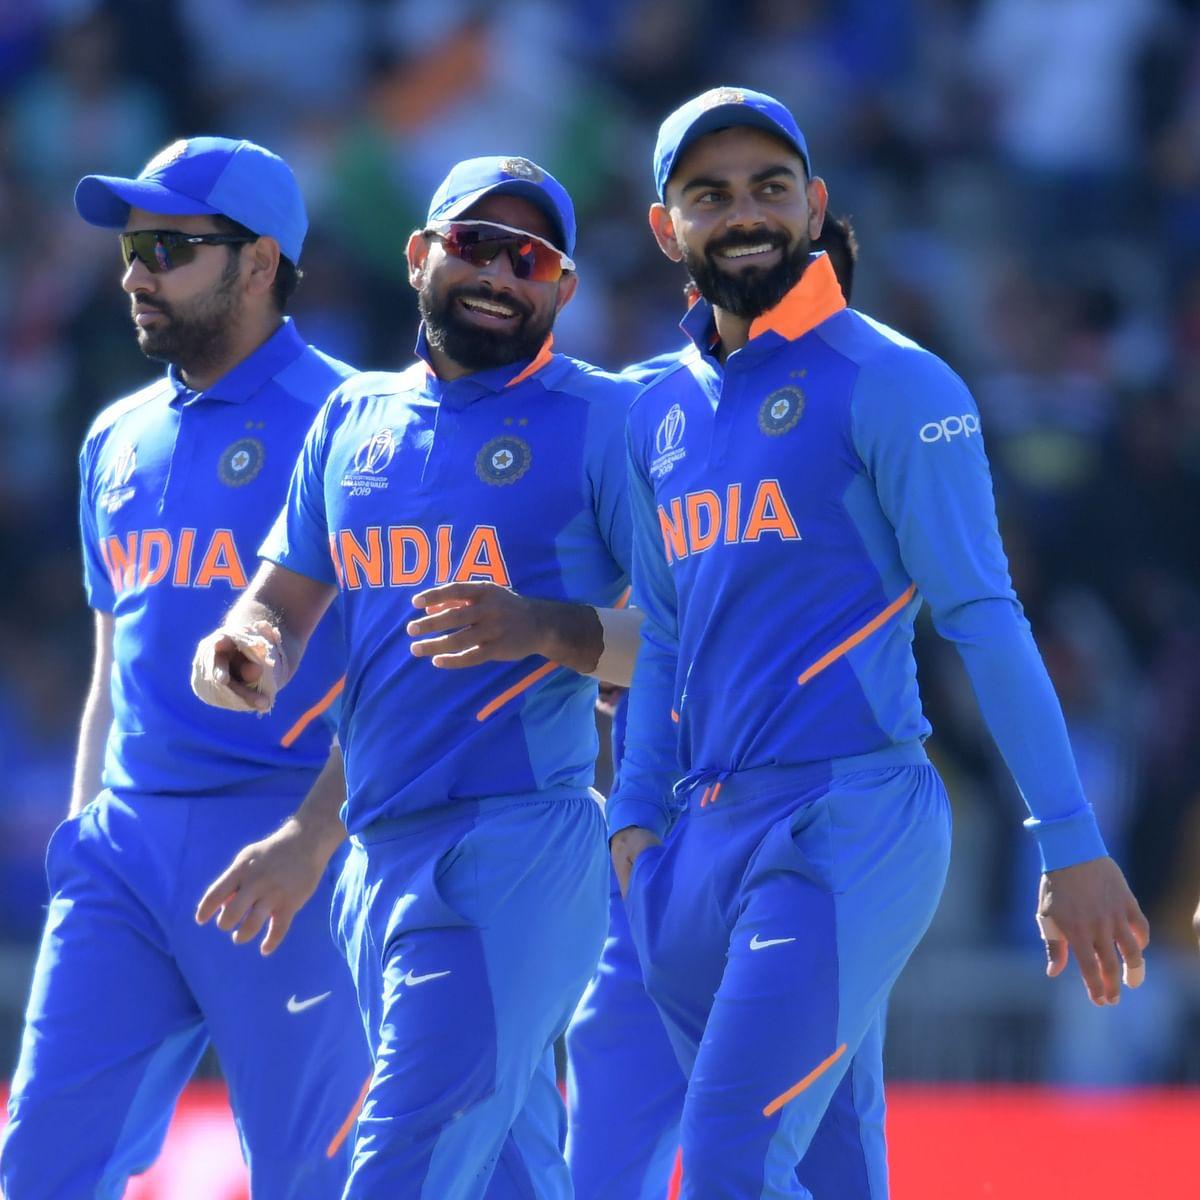 Cricket Score - England vs India World Cup 2019 Match 38